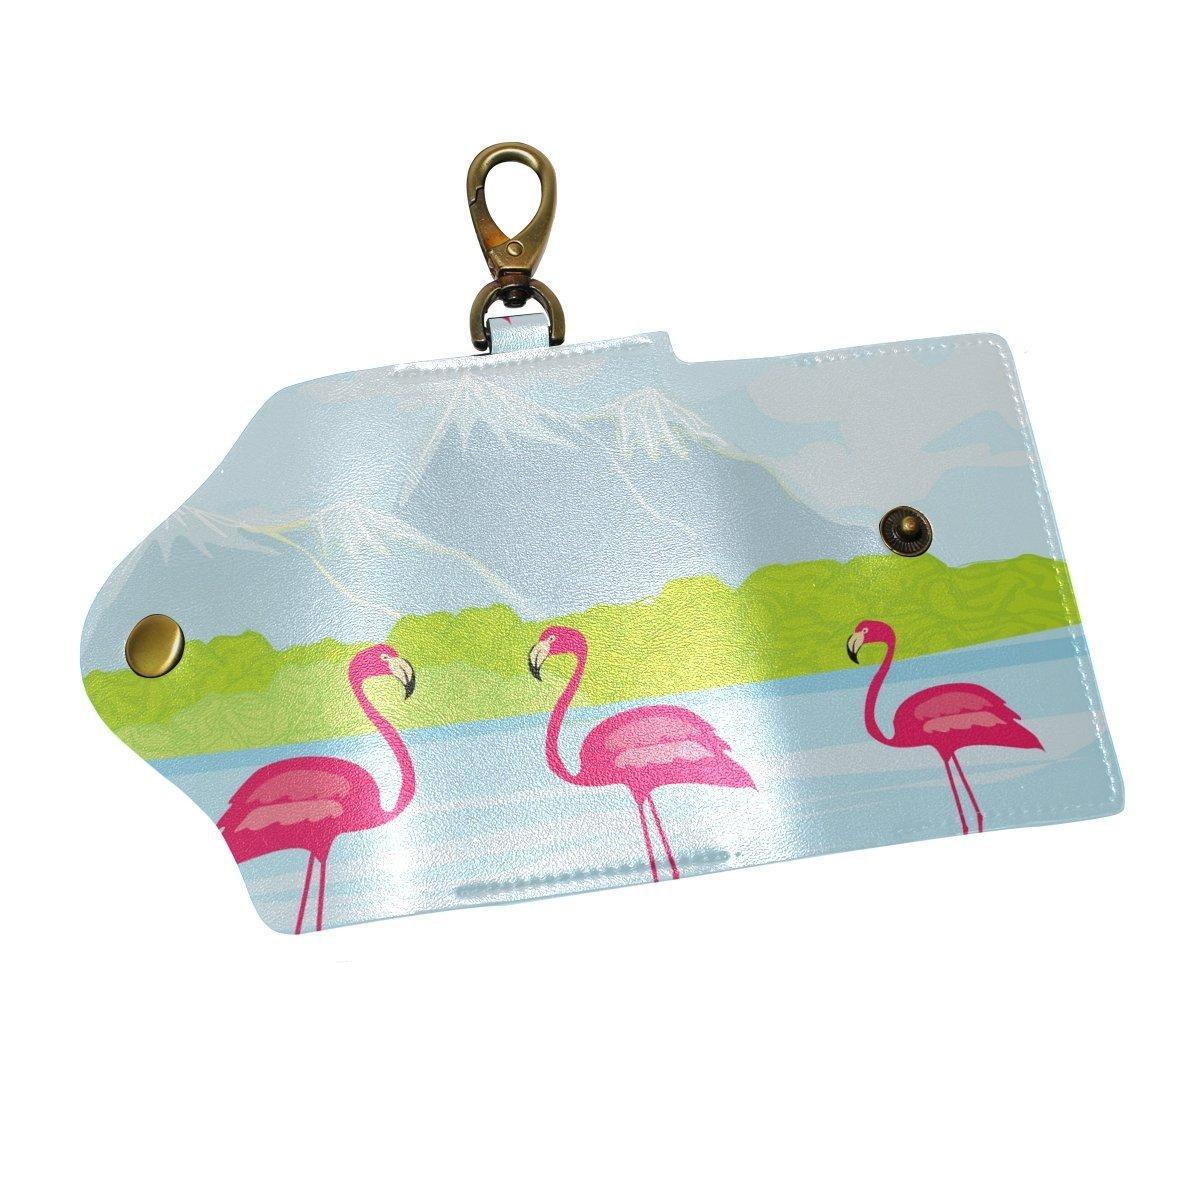 DEYYA Three Pink Flamingos The Water Leather Key Case Wallets Unisex Keychain Key Holder with 6 Hooks Snap Closure